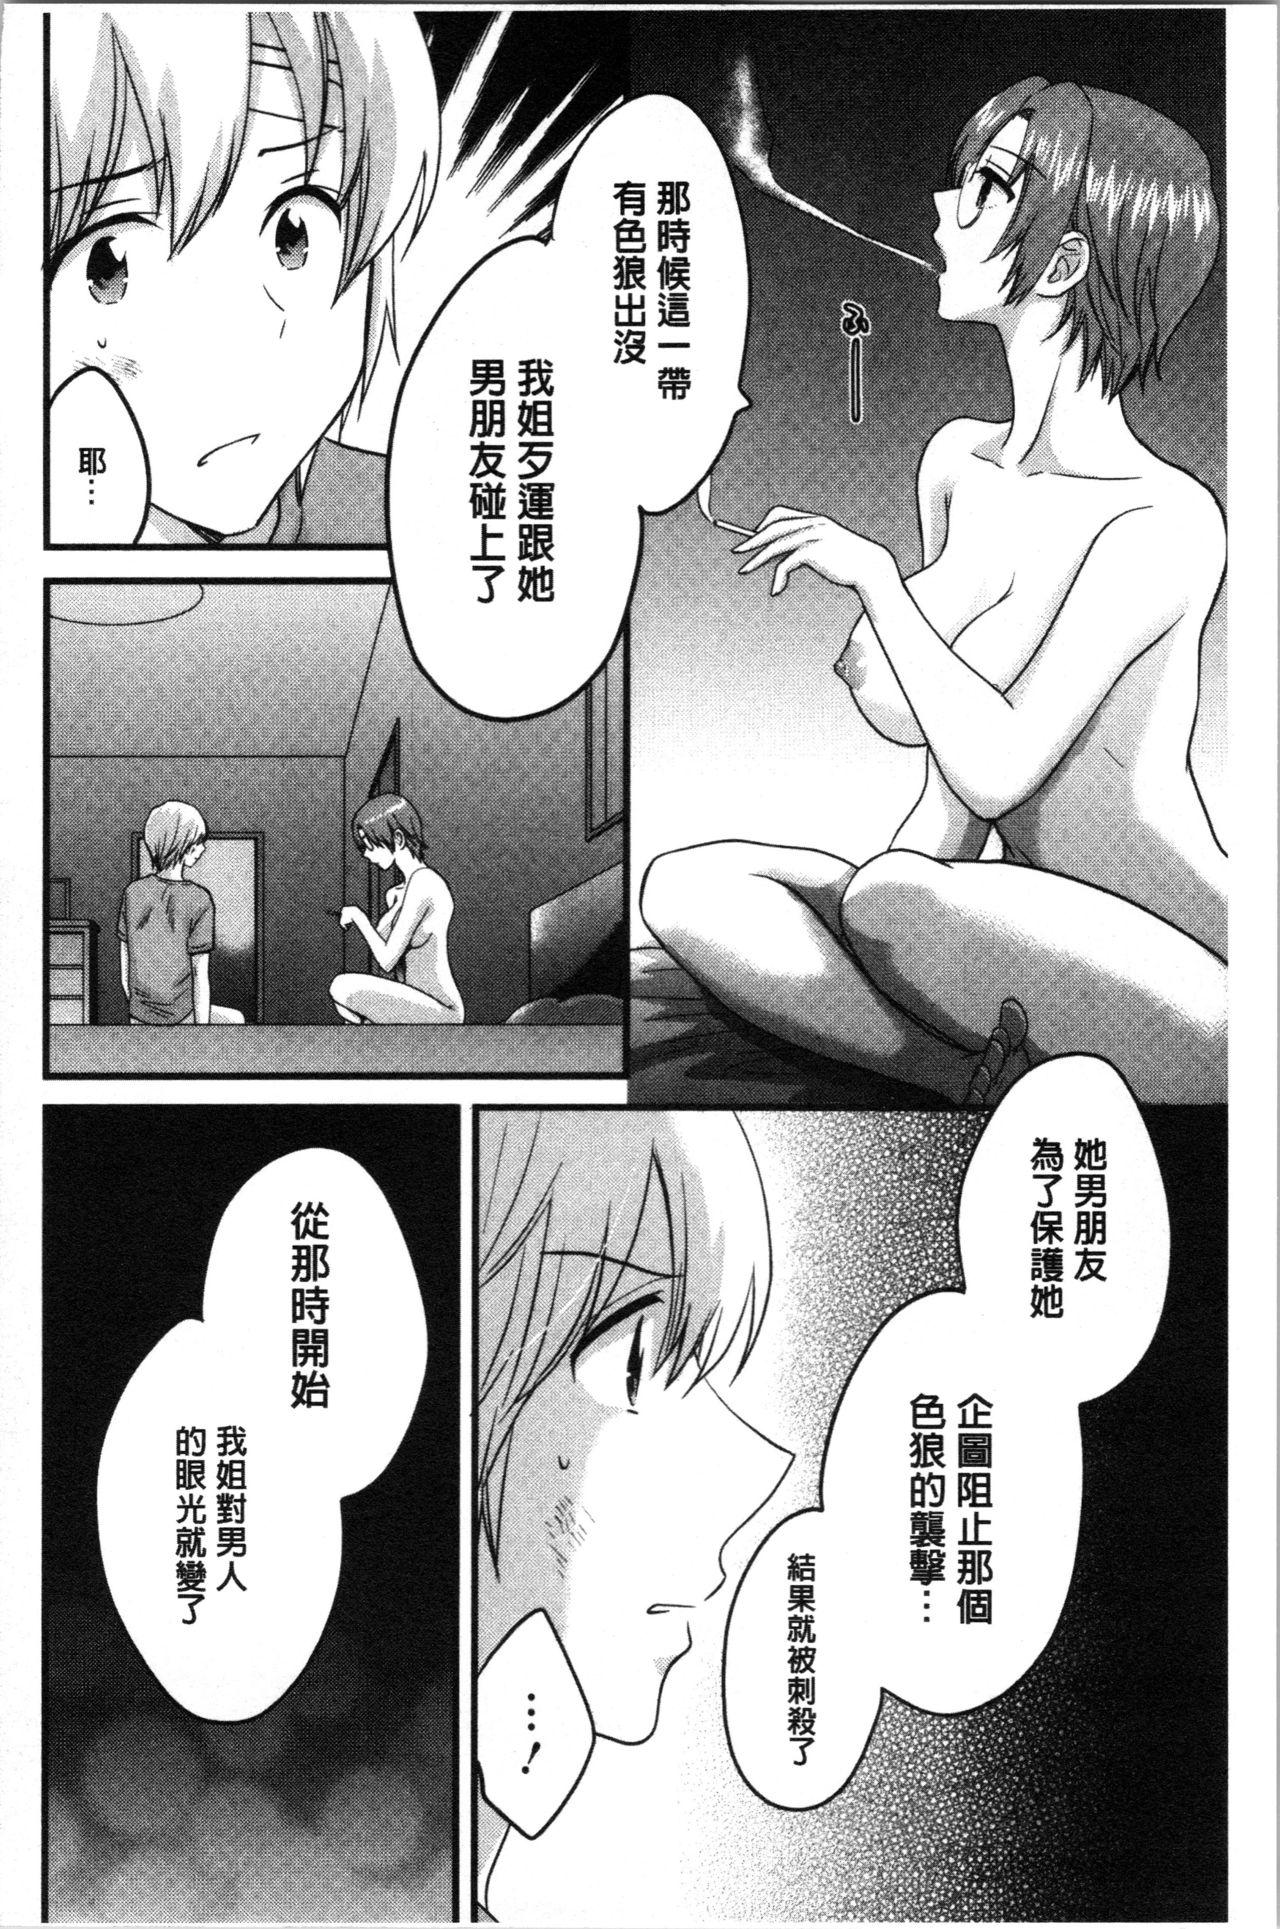 Ottori Midarana Mikami-san   嫻淑優雅又淫亂的三上小姐 131